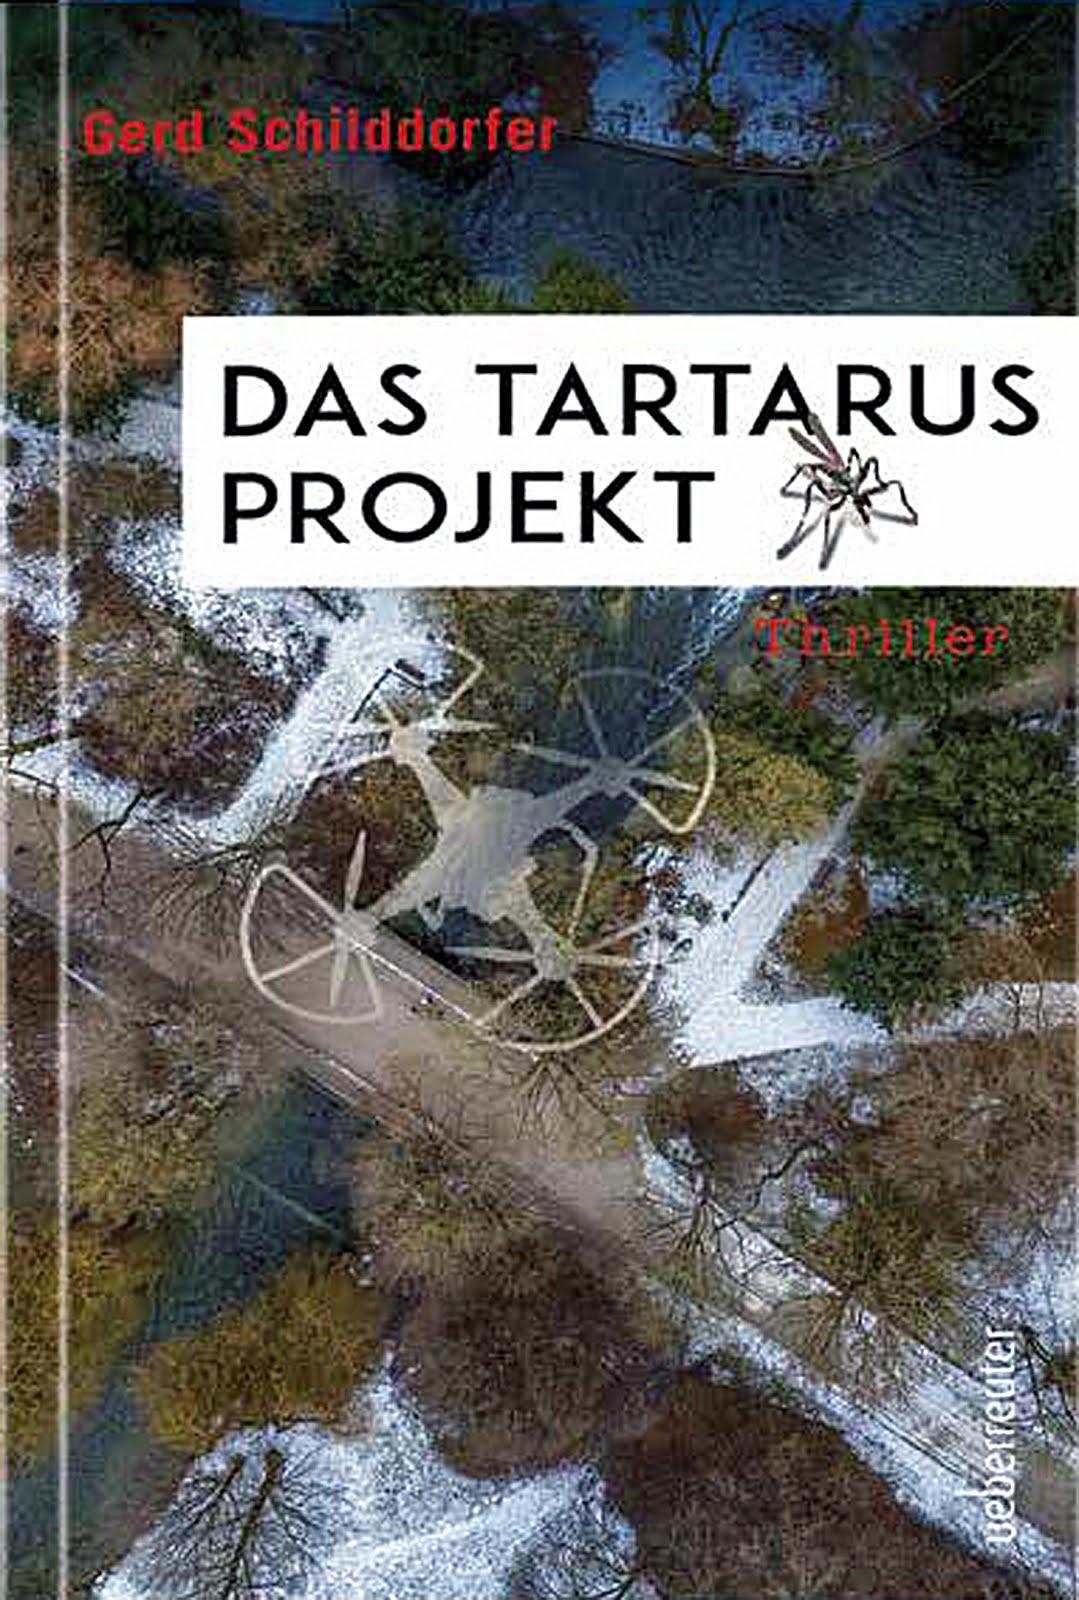 Das Tartarus Projekt